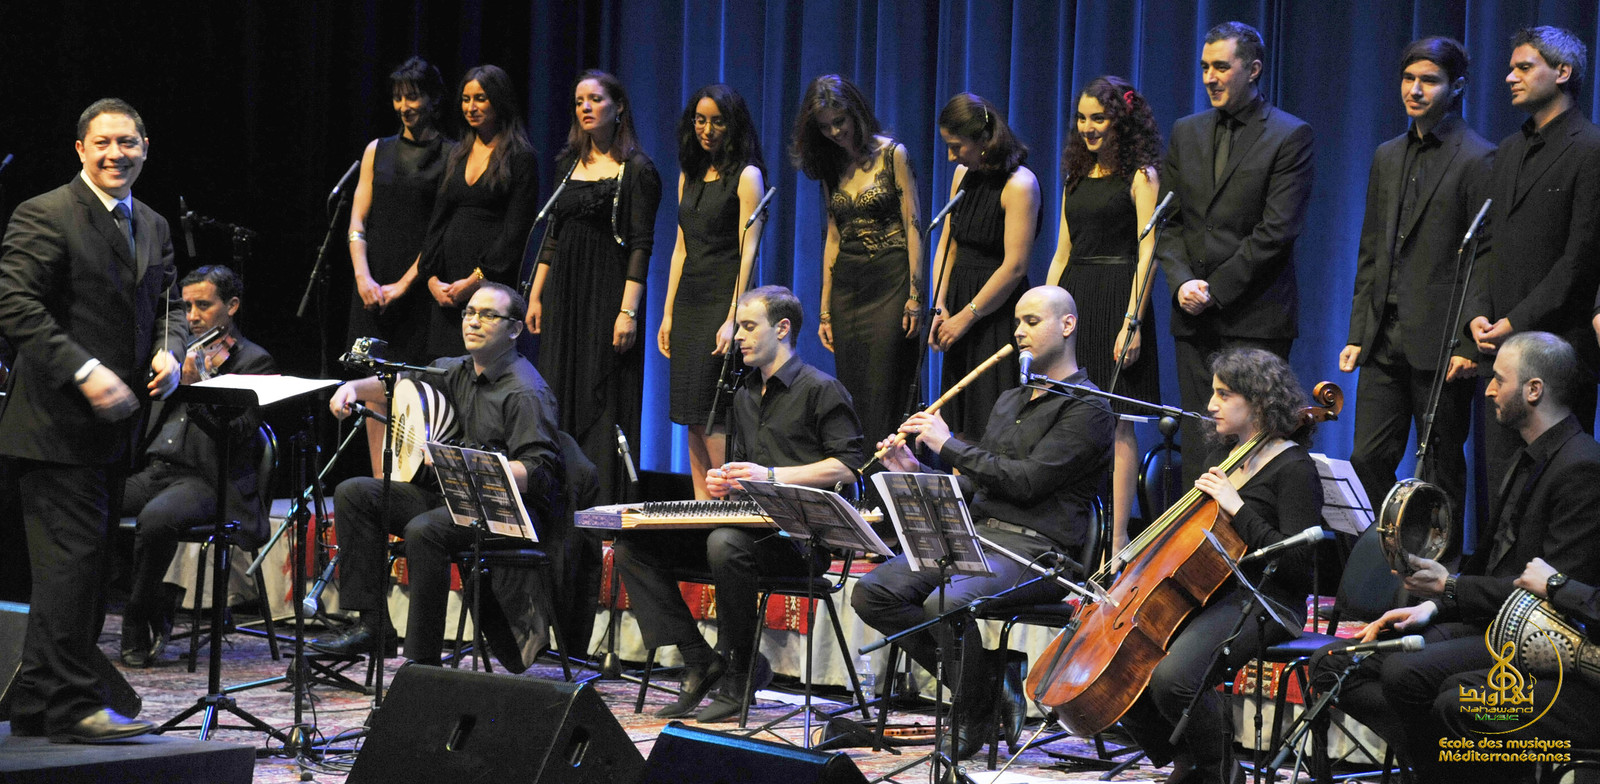 cherche concert musique arabe.jpg